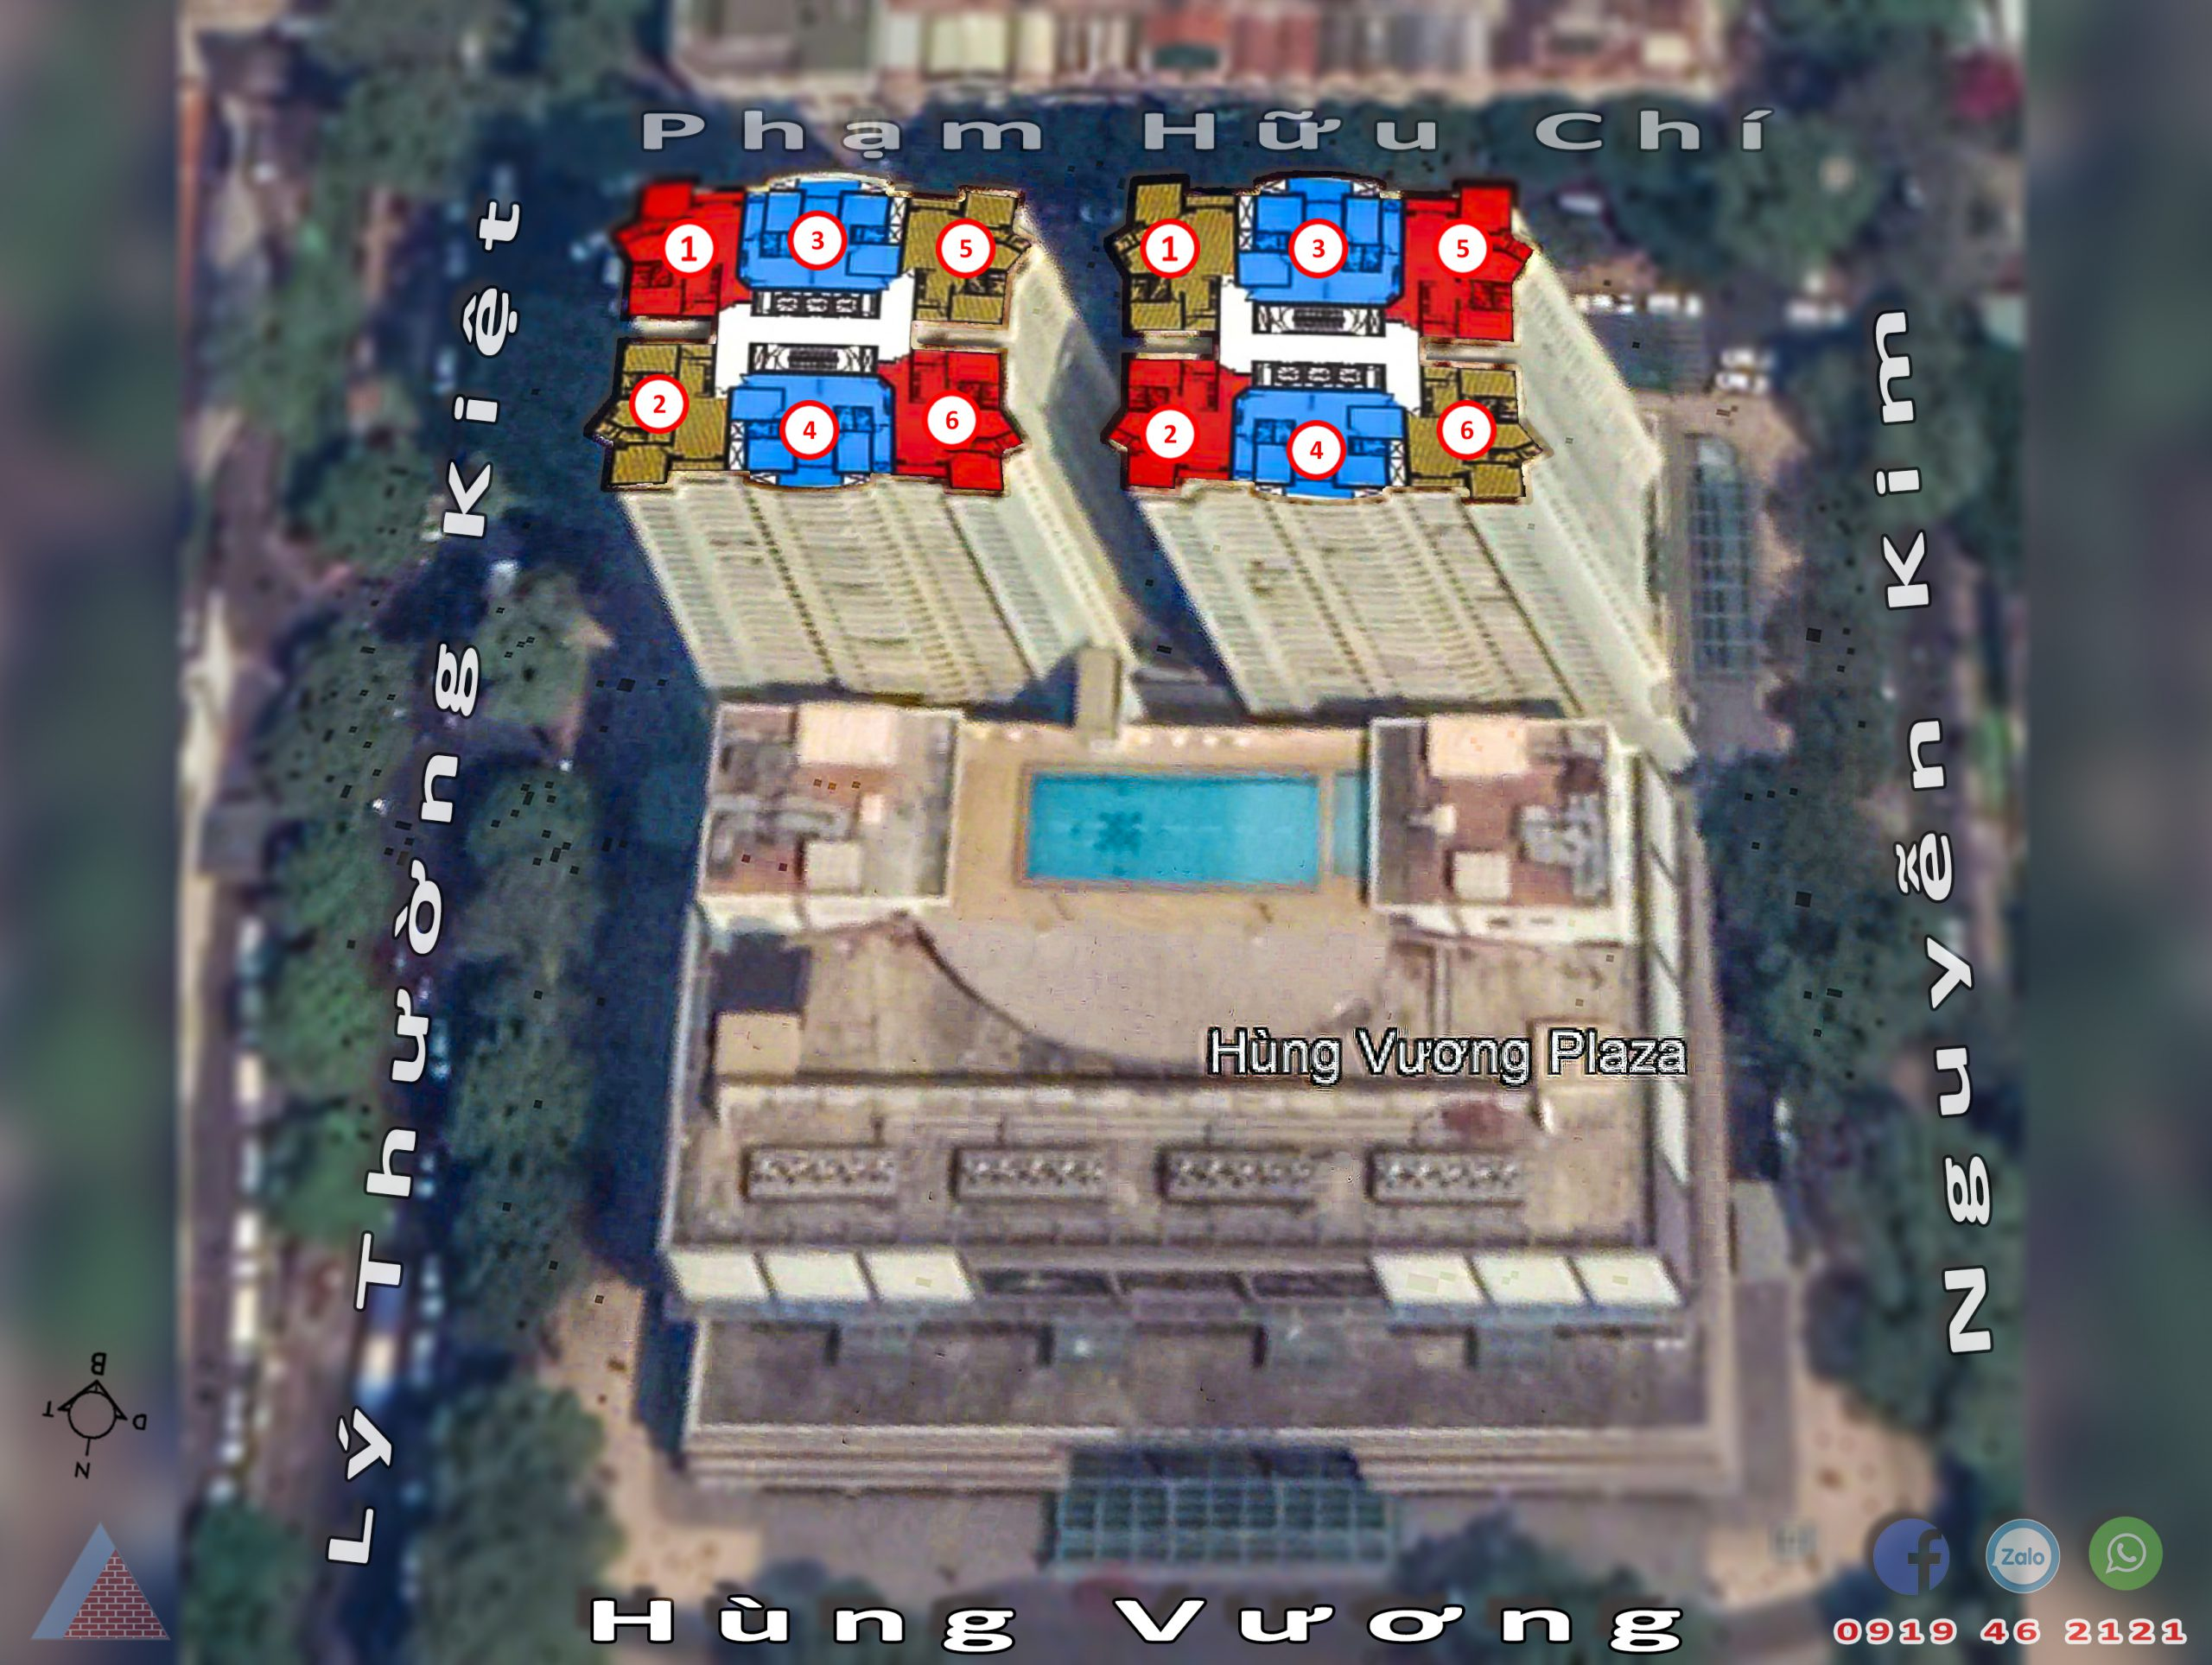 Hung-Vuong-Plaza-tien-ich-can-ho-0